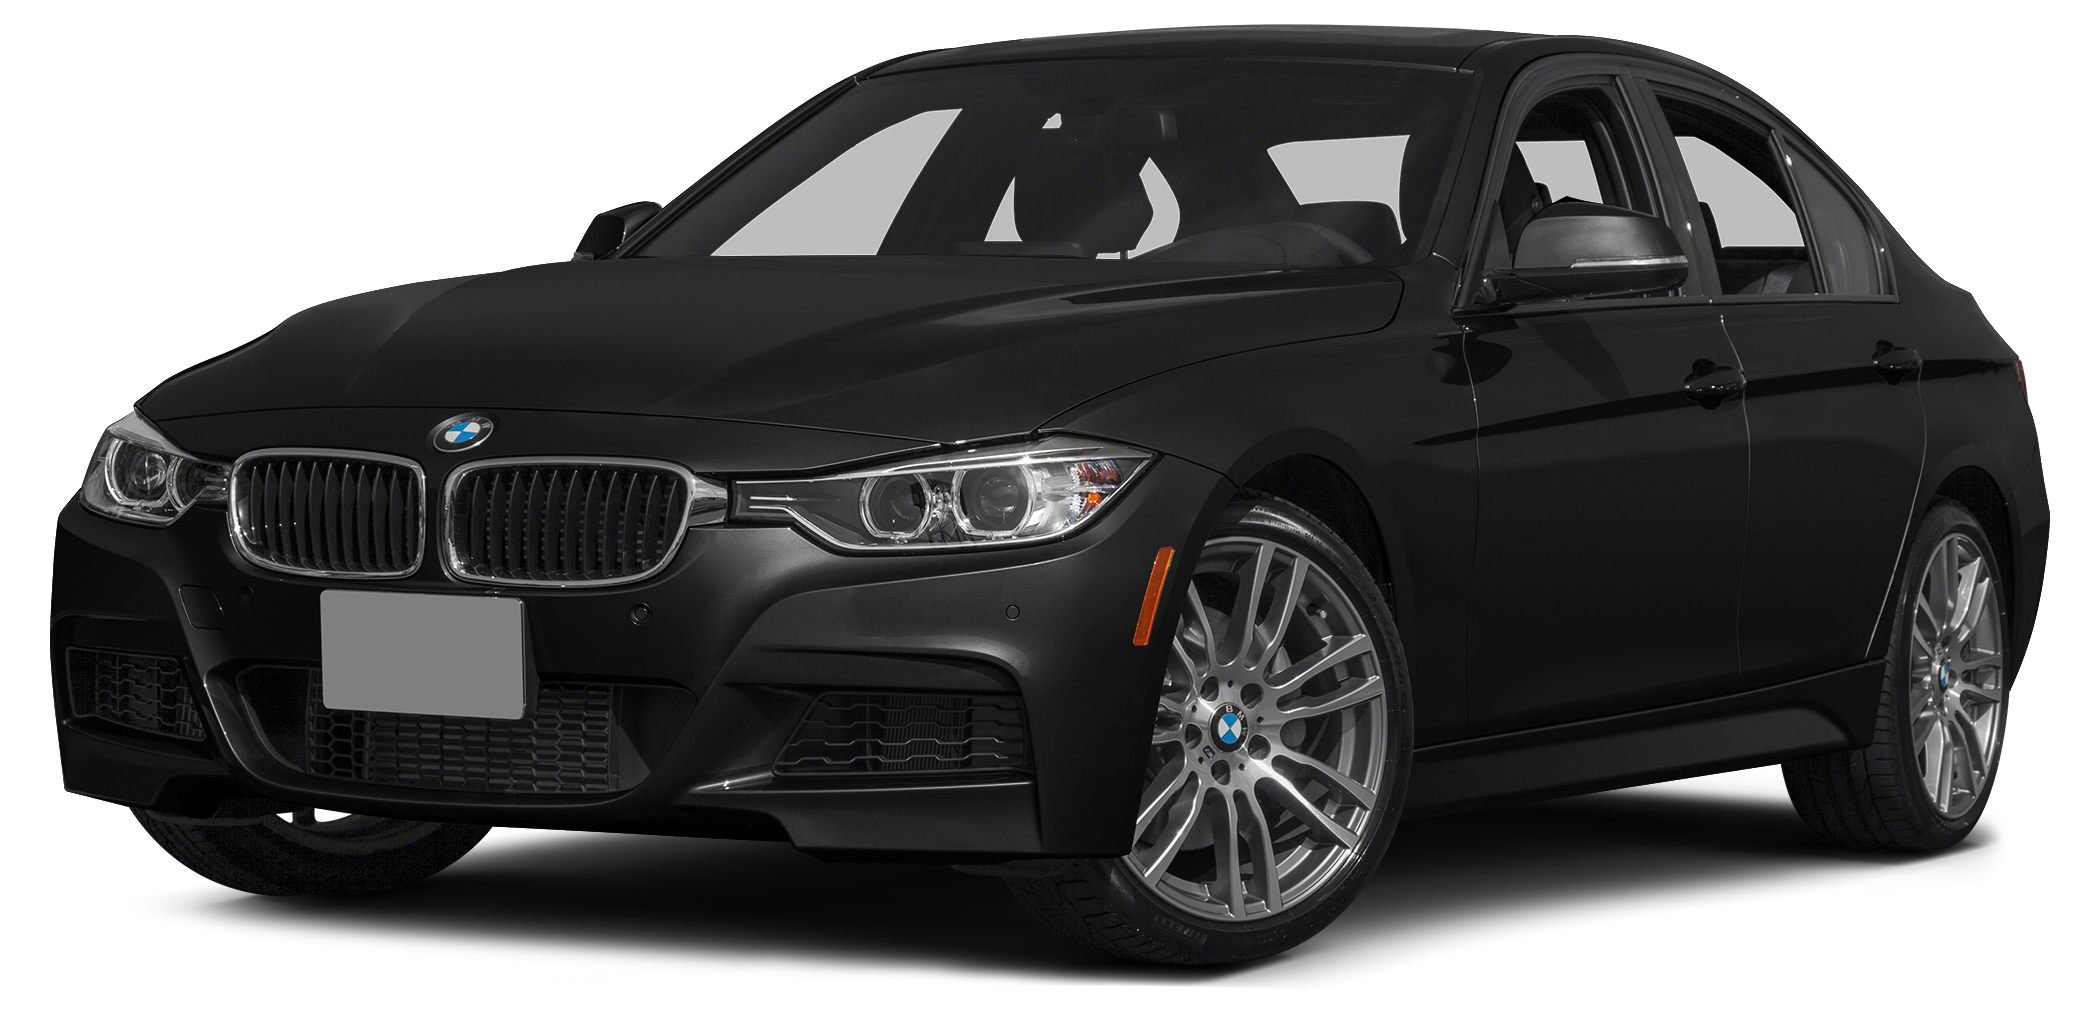 2013 BMW 3 Series 335i Miles 45899Color Jet Black Stock 475969 VIN WBA3A9C53DF475969